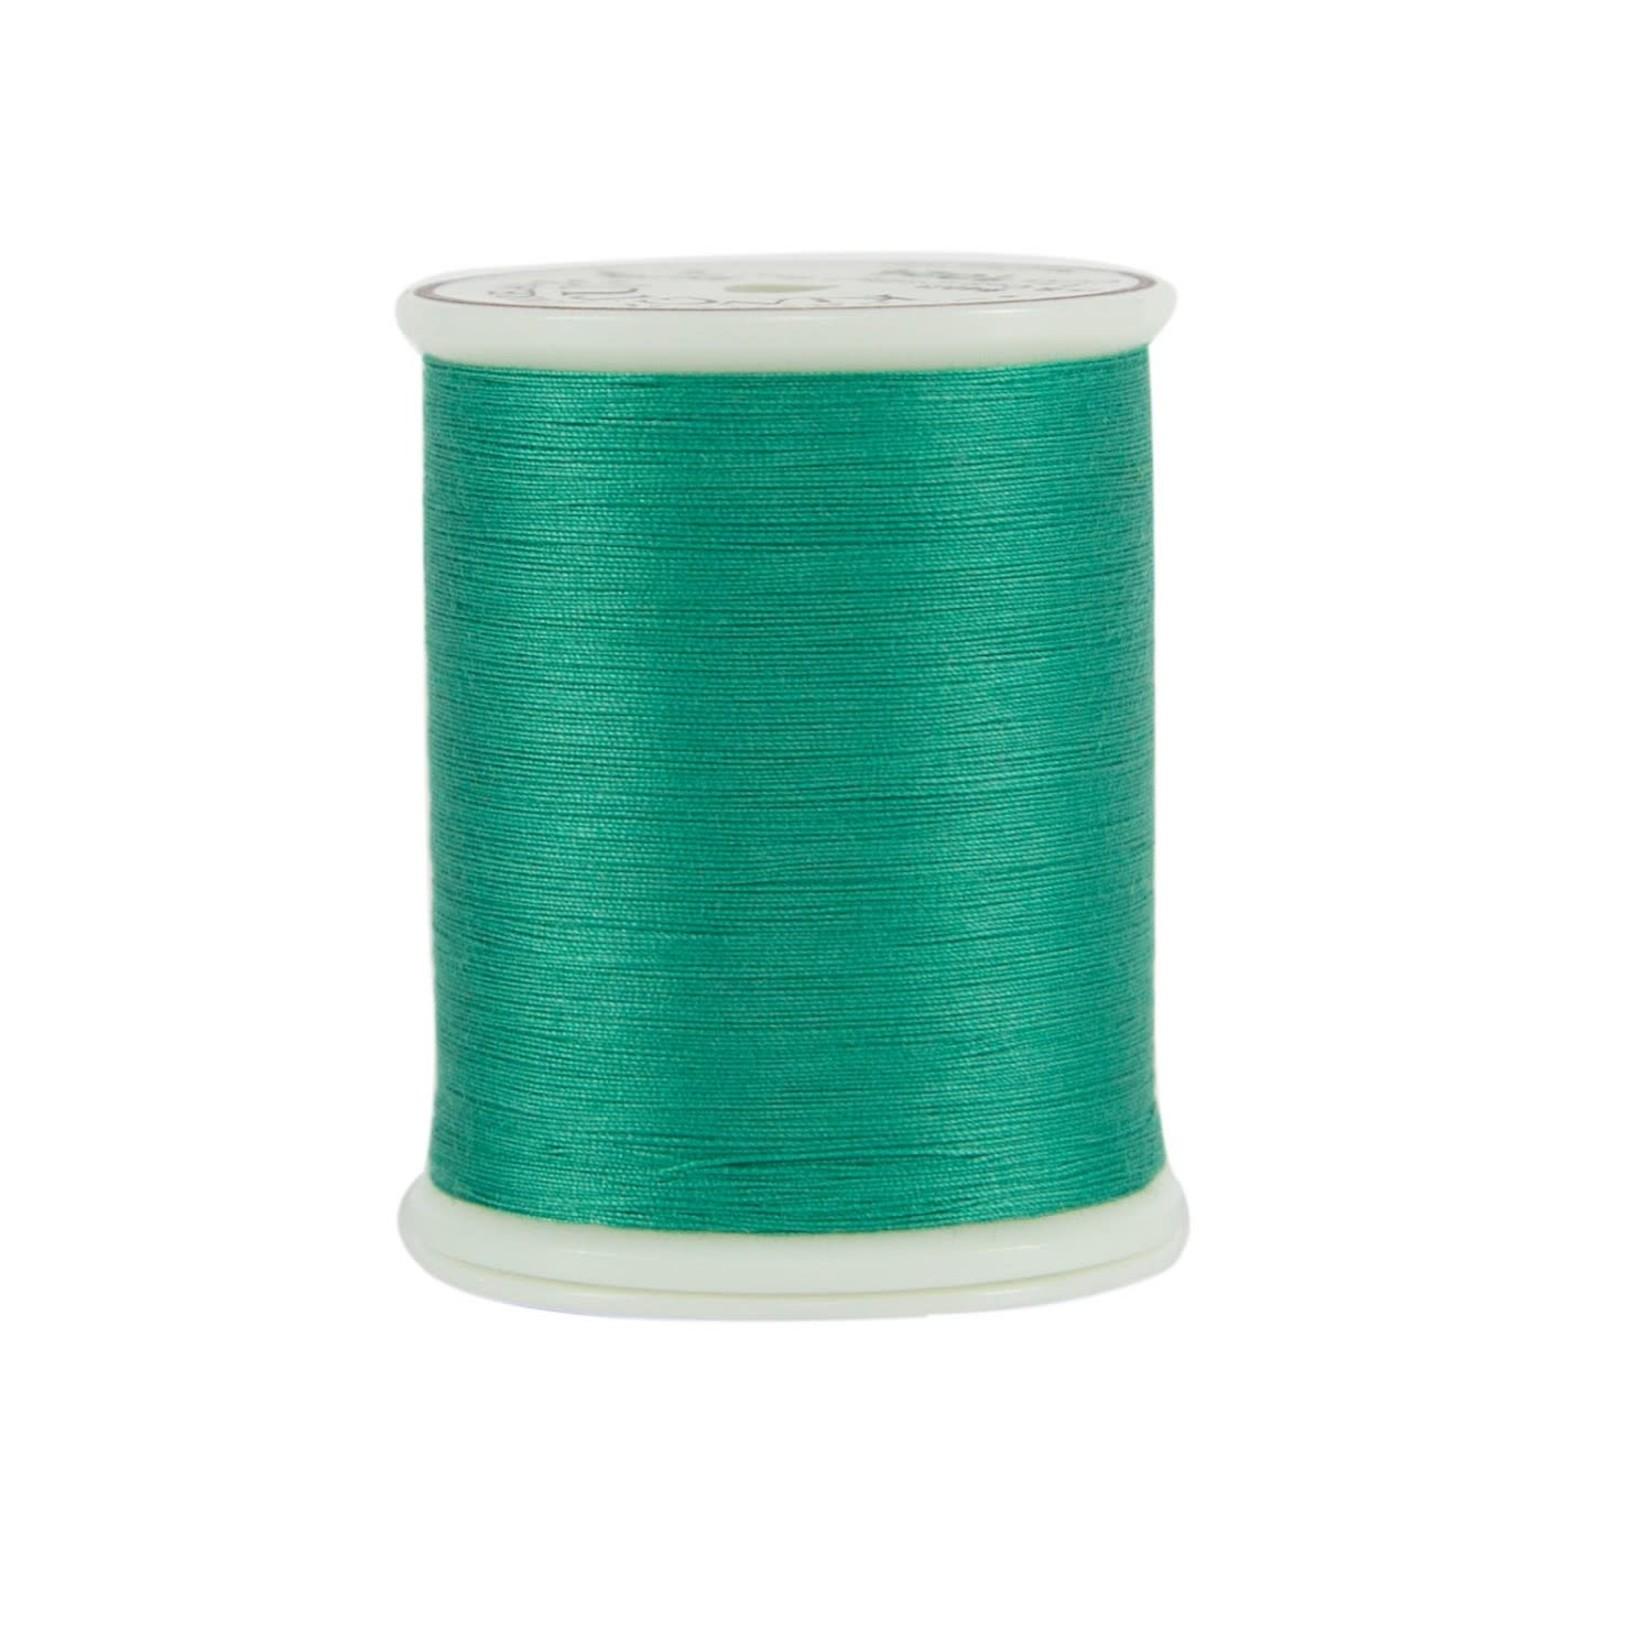 Superior Threads King Tut - #40 - 457 m - 1024 Chinese Jade